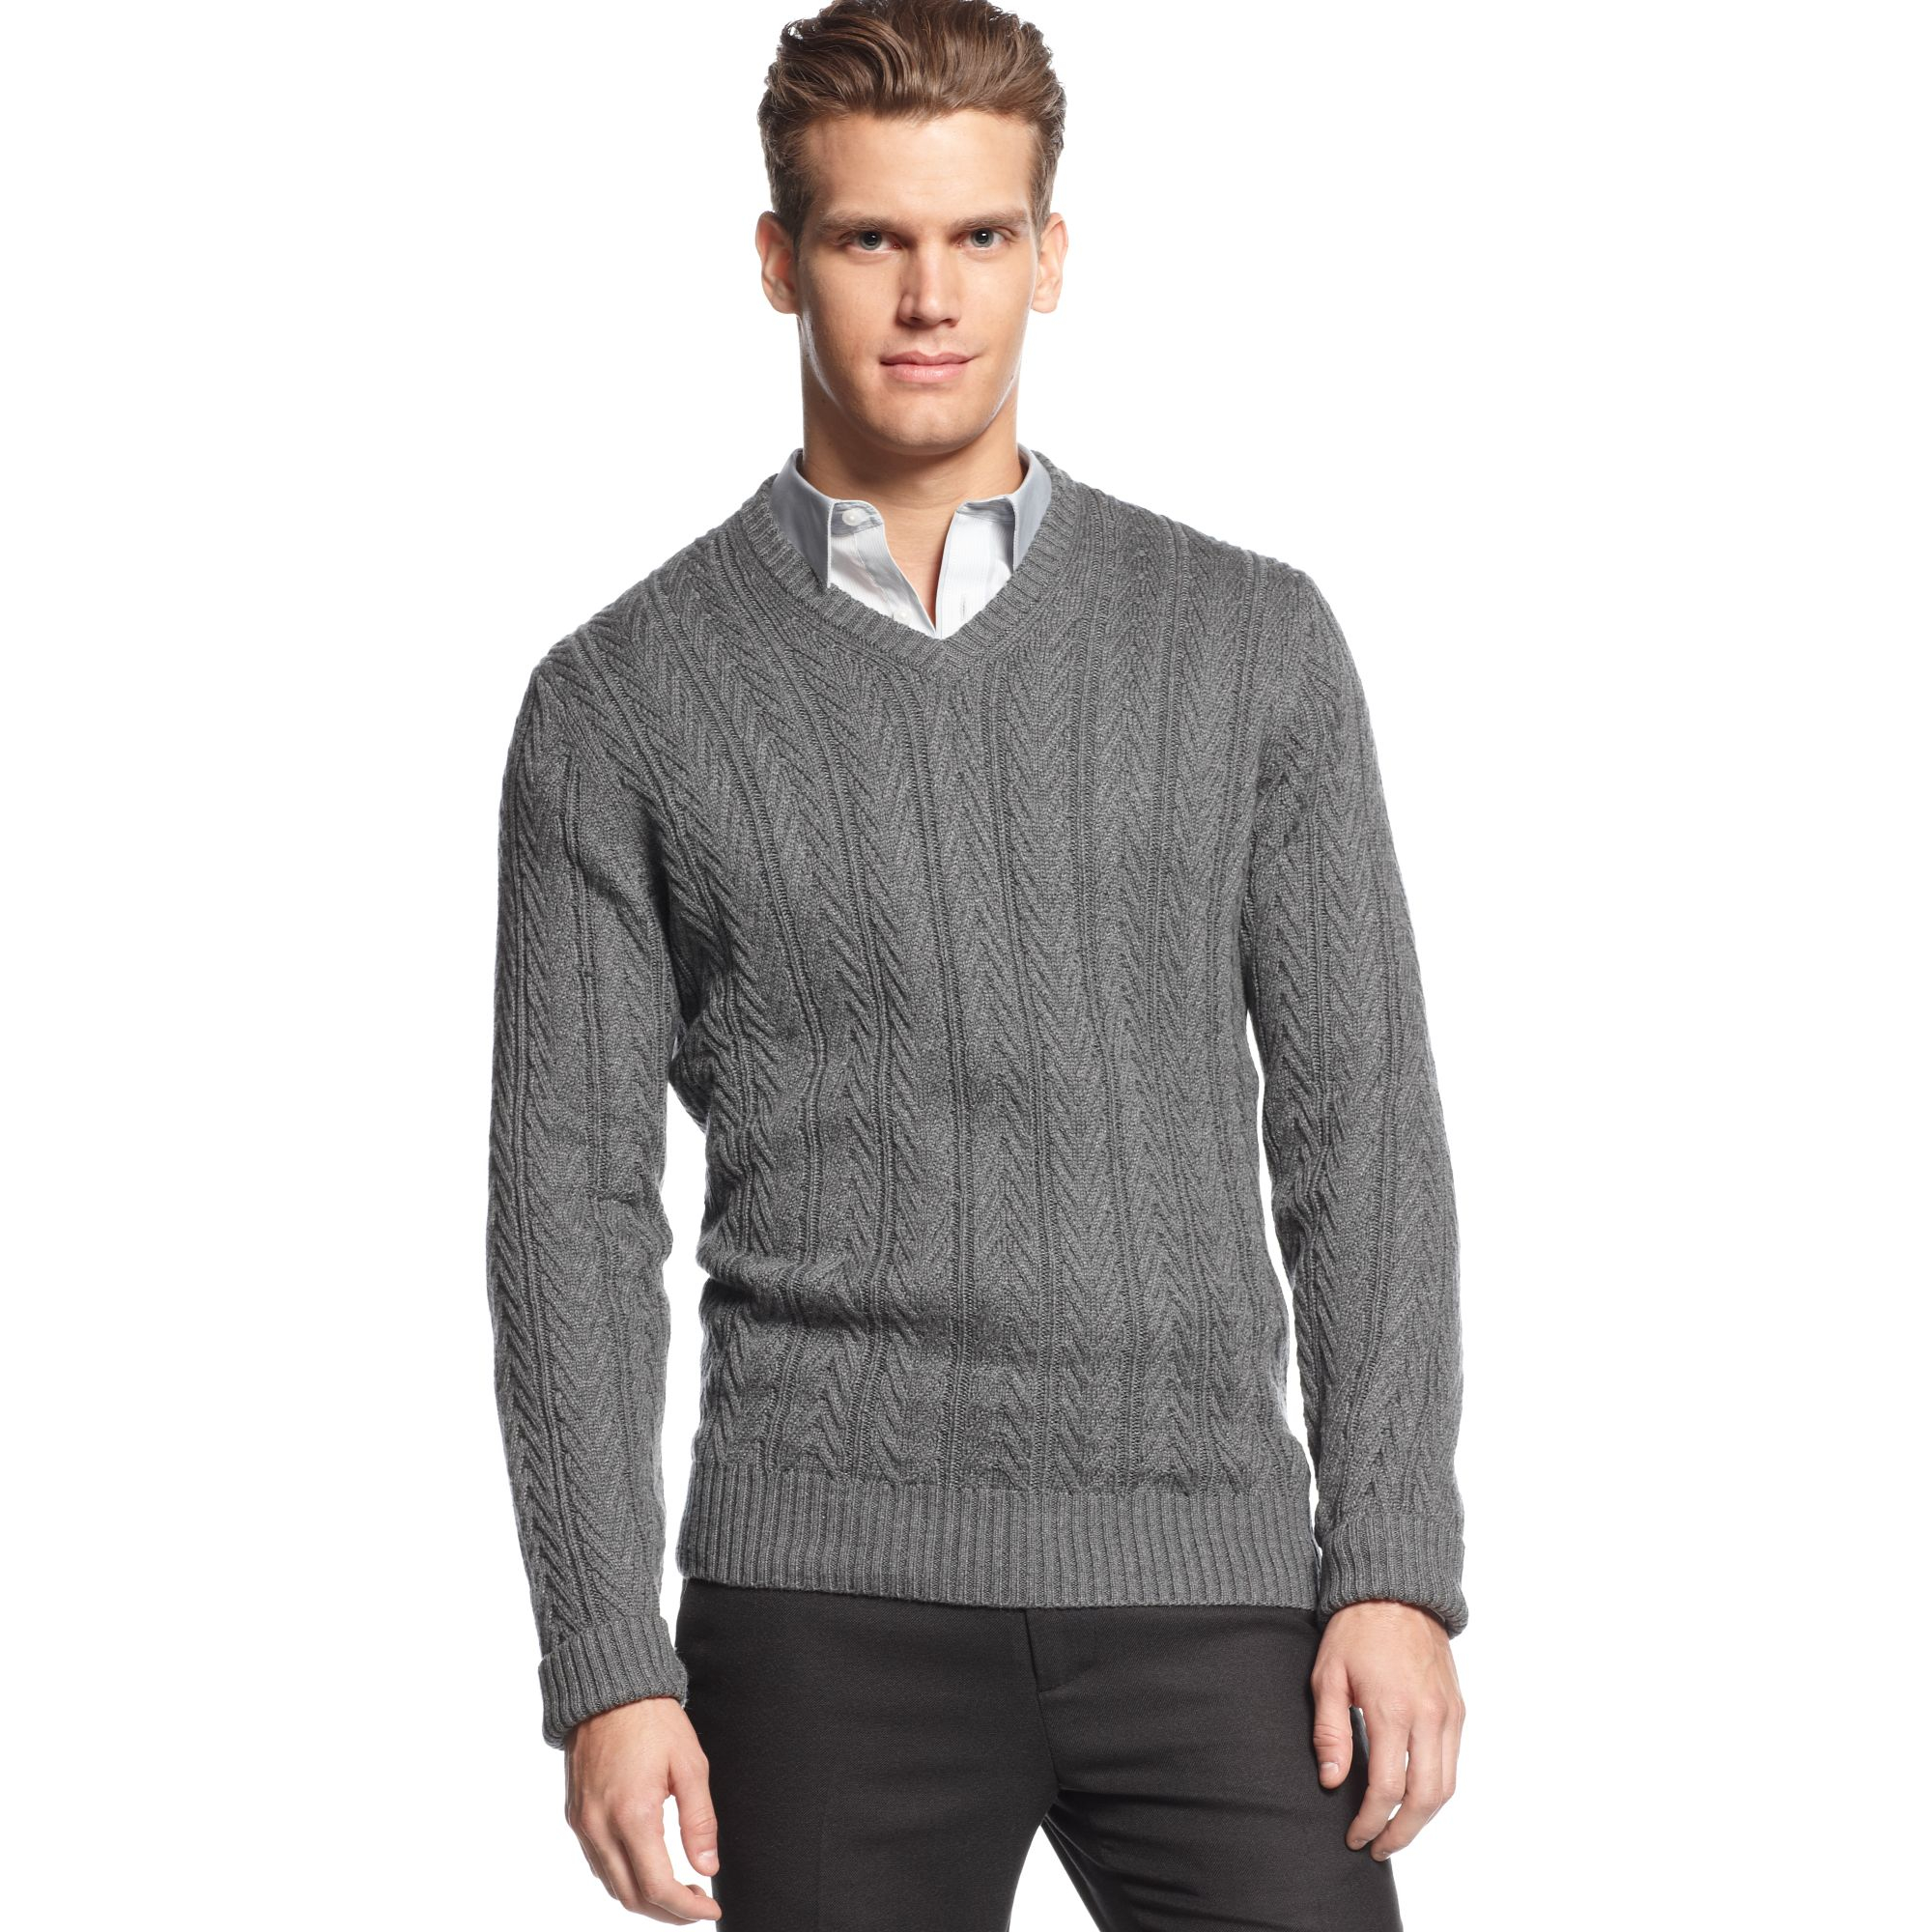 calvin klein vneck cable knit sweater in gray for men lyst. Black Bedroom Furniture Sets. Home Design Ideas